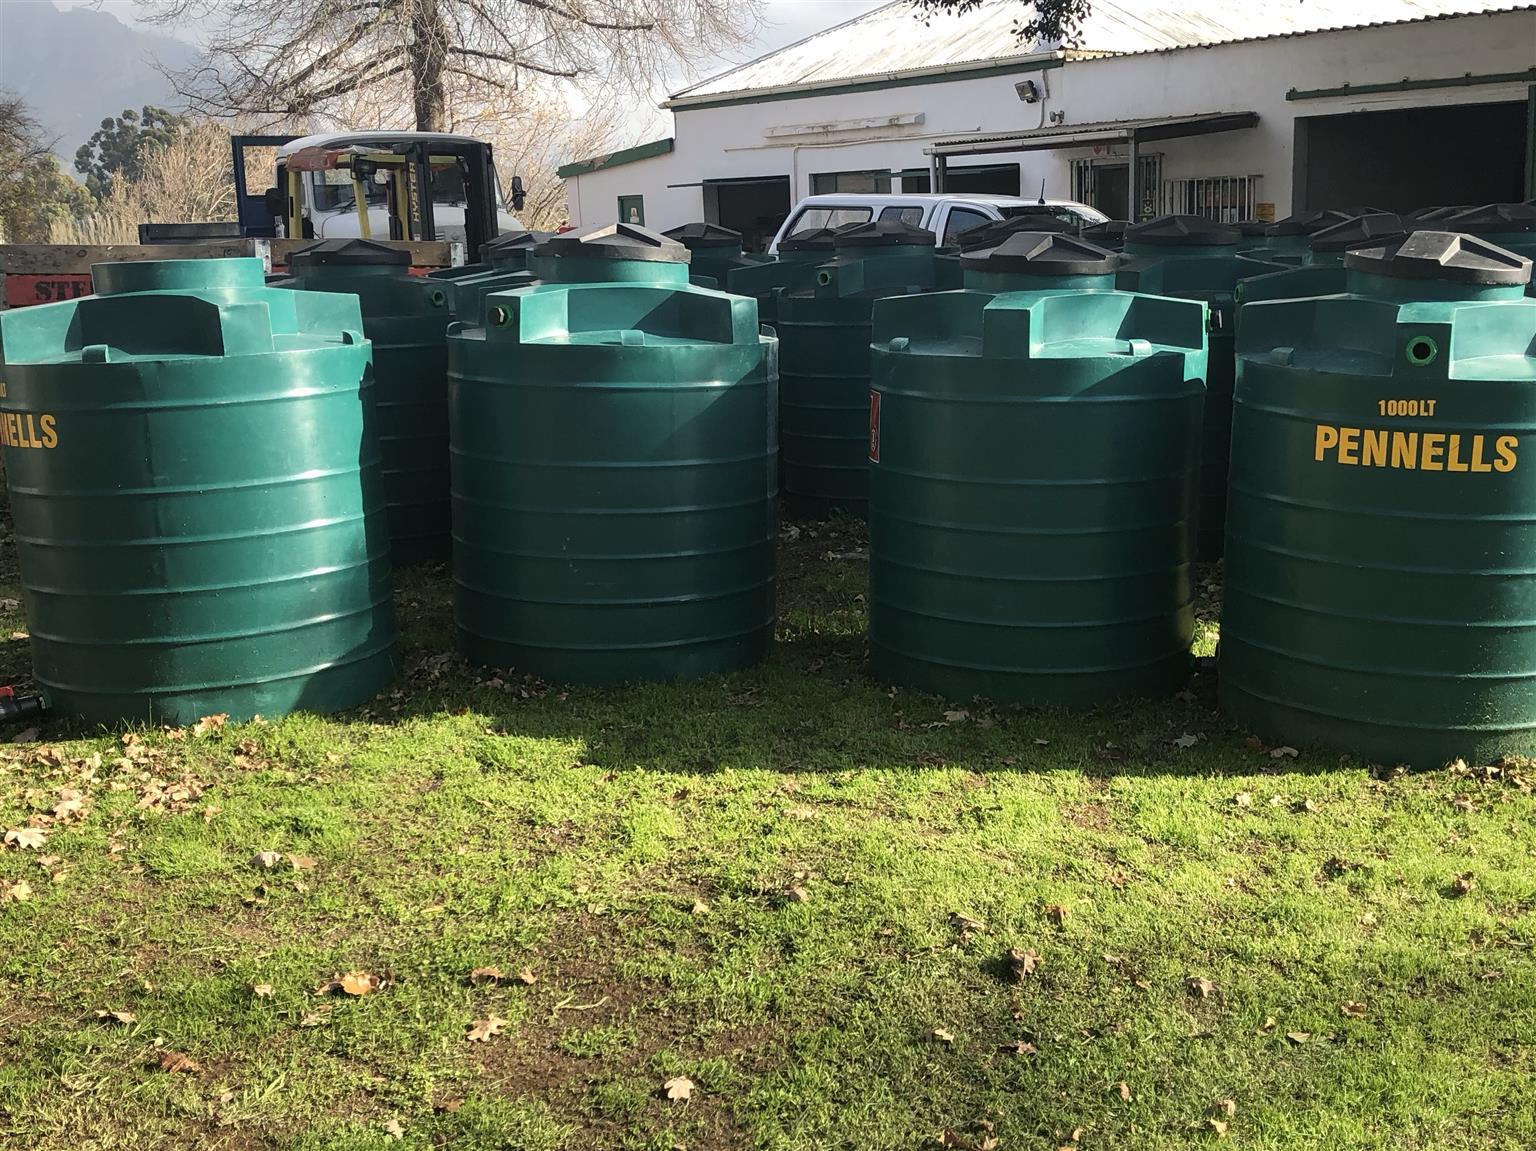 Water Tanks For Sale >> 1000l Water Tanks For Sale At Cost Junk Mail